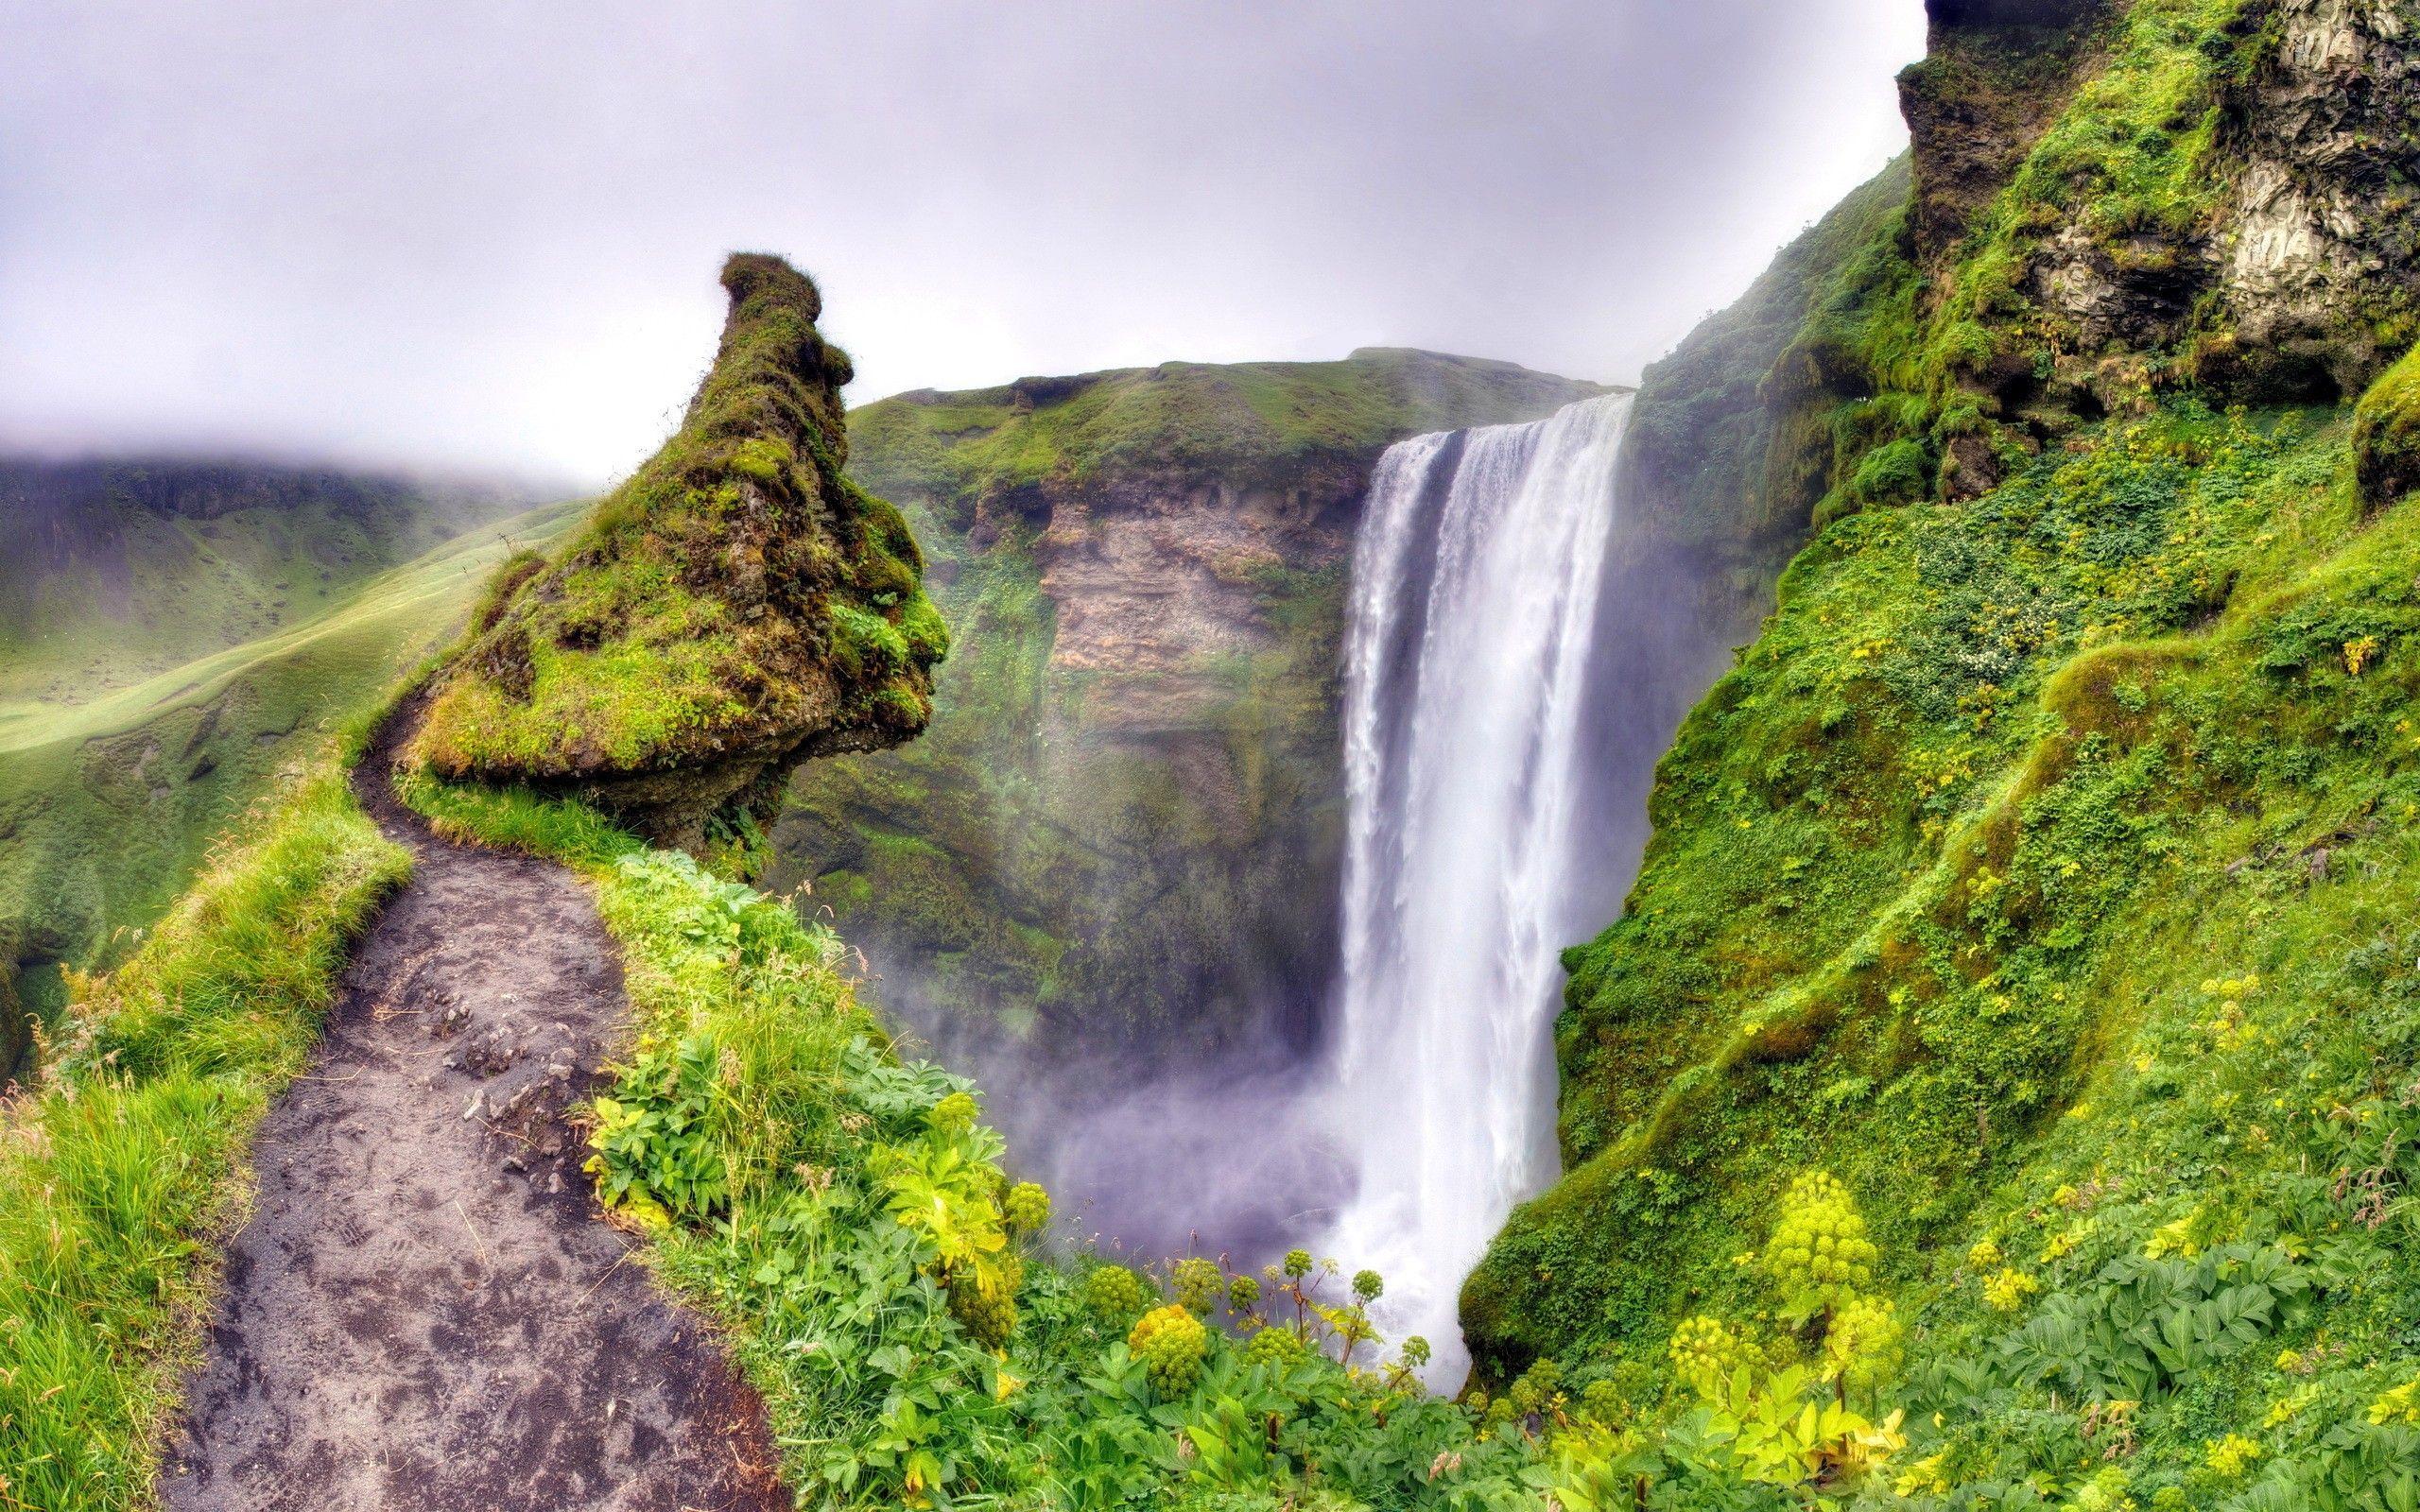 Green Moss Canyon Waterfall